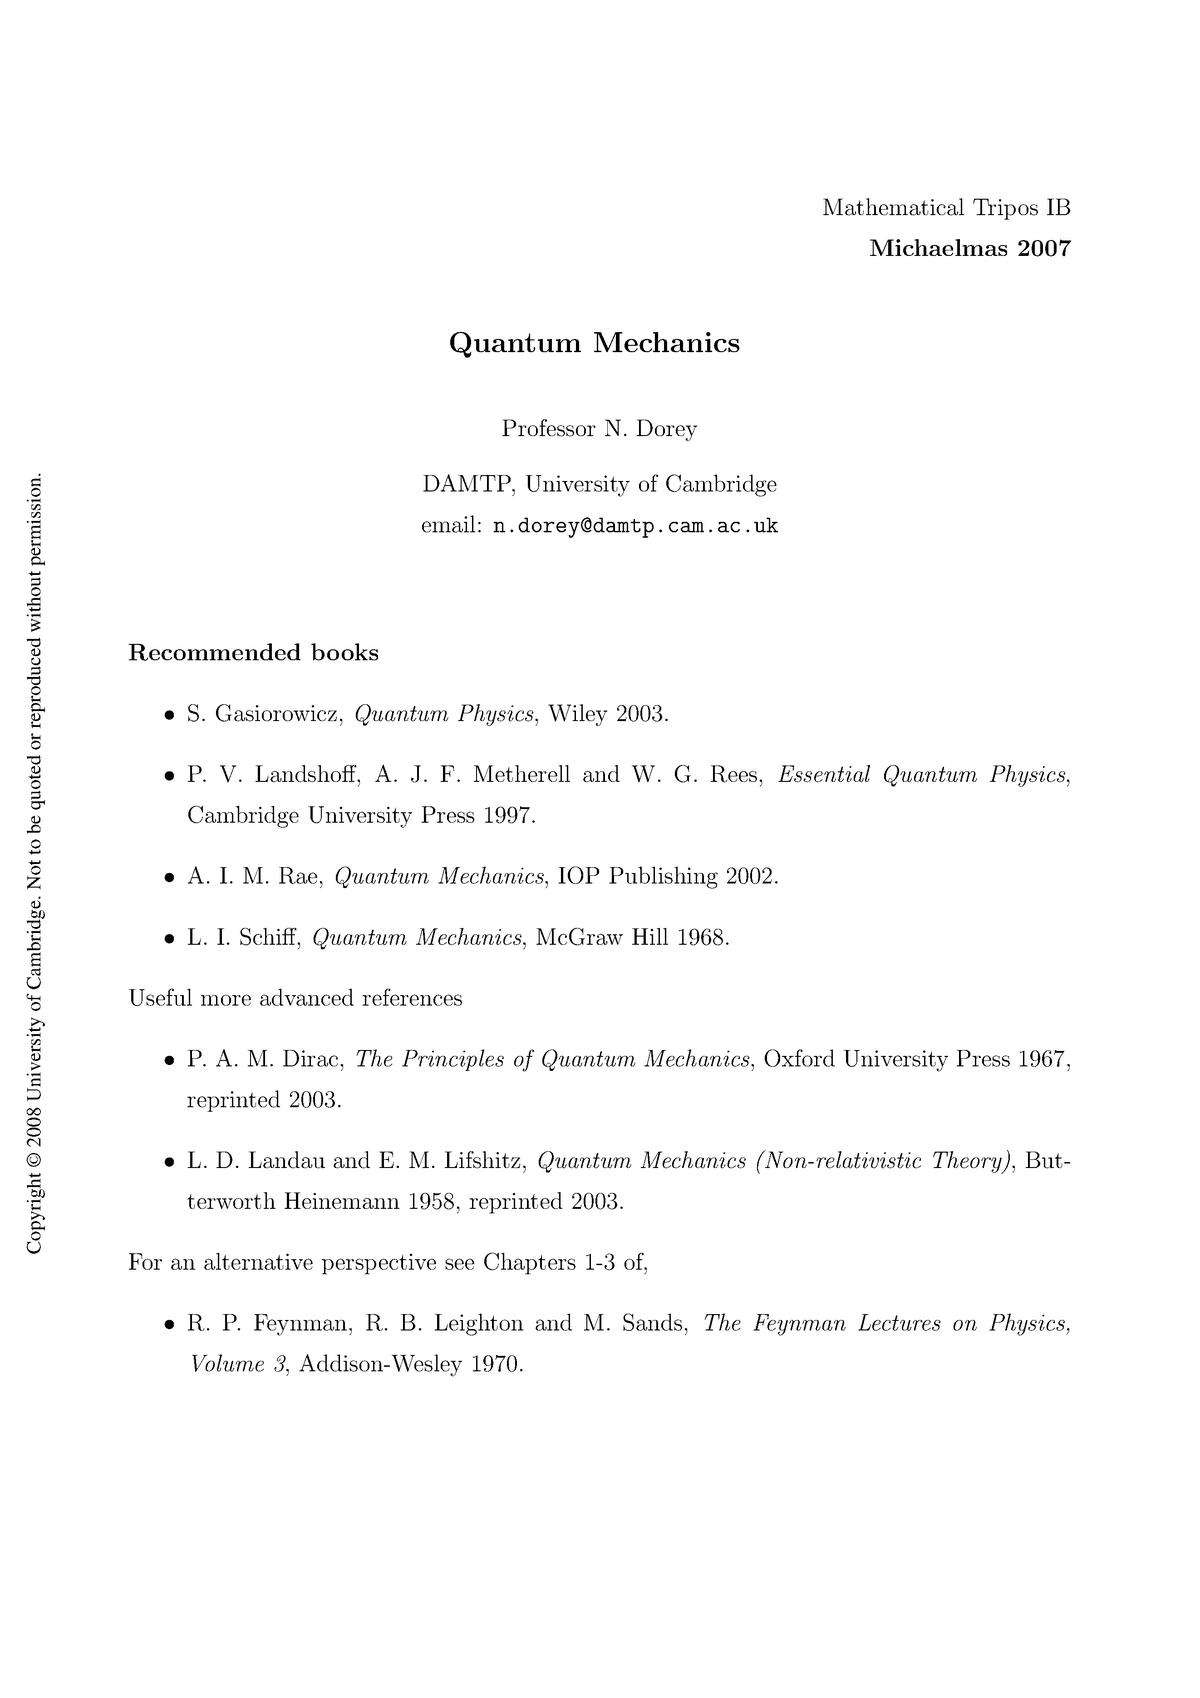 Lecture notes, lecture All - B9: Quantum Mechanics - StuDocu